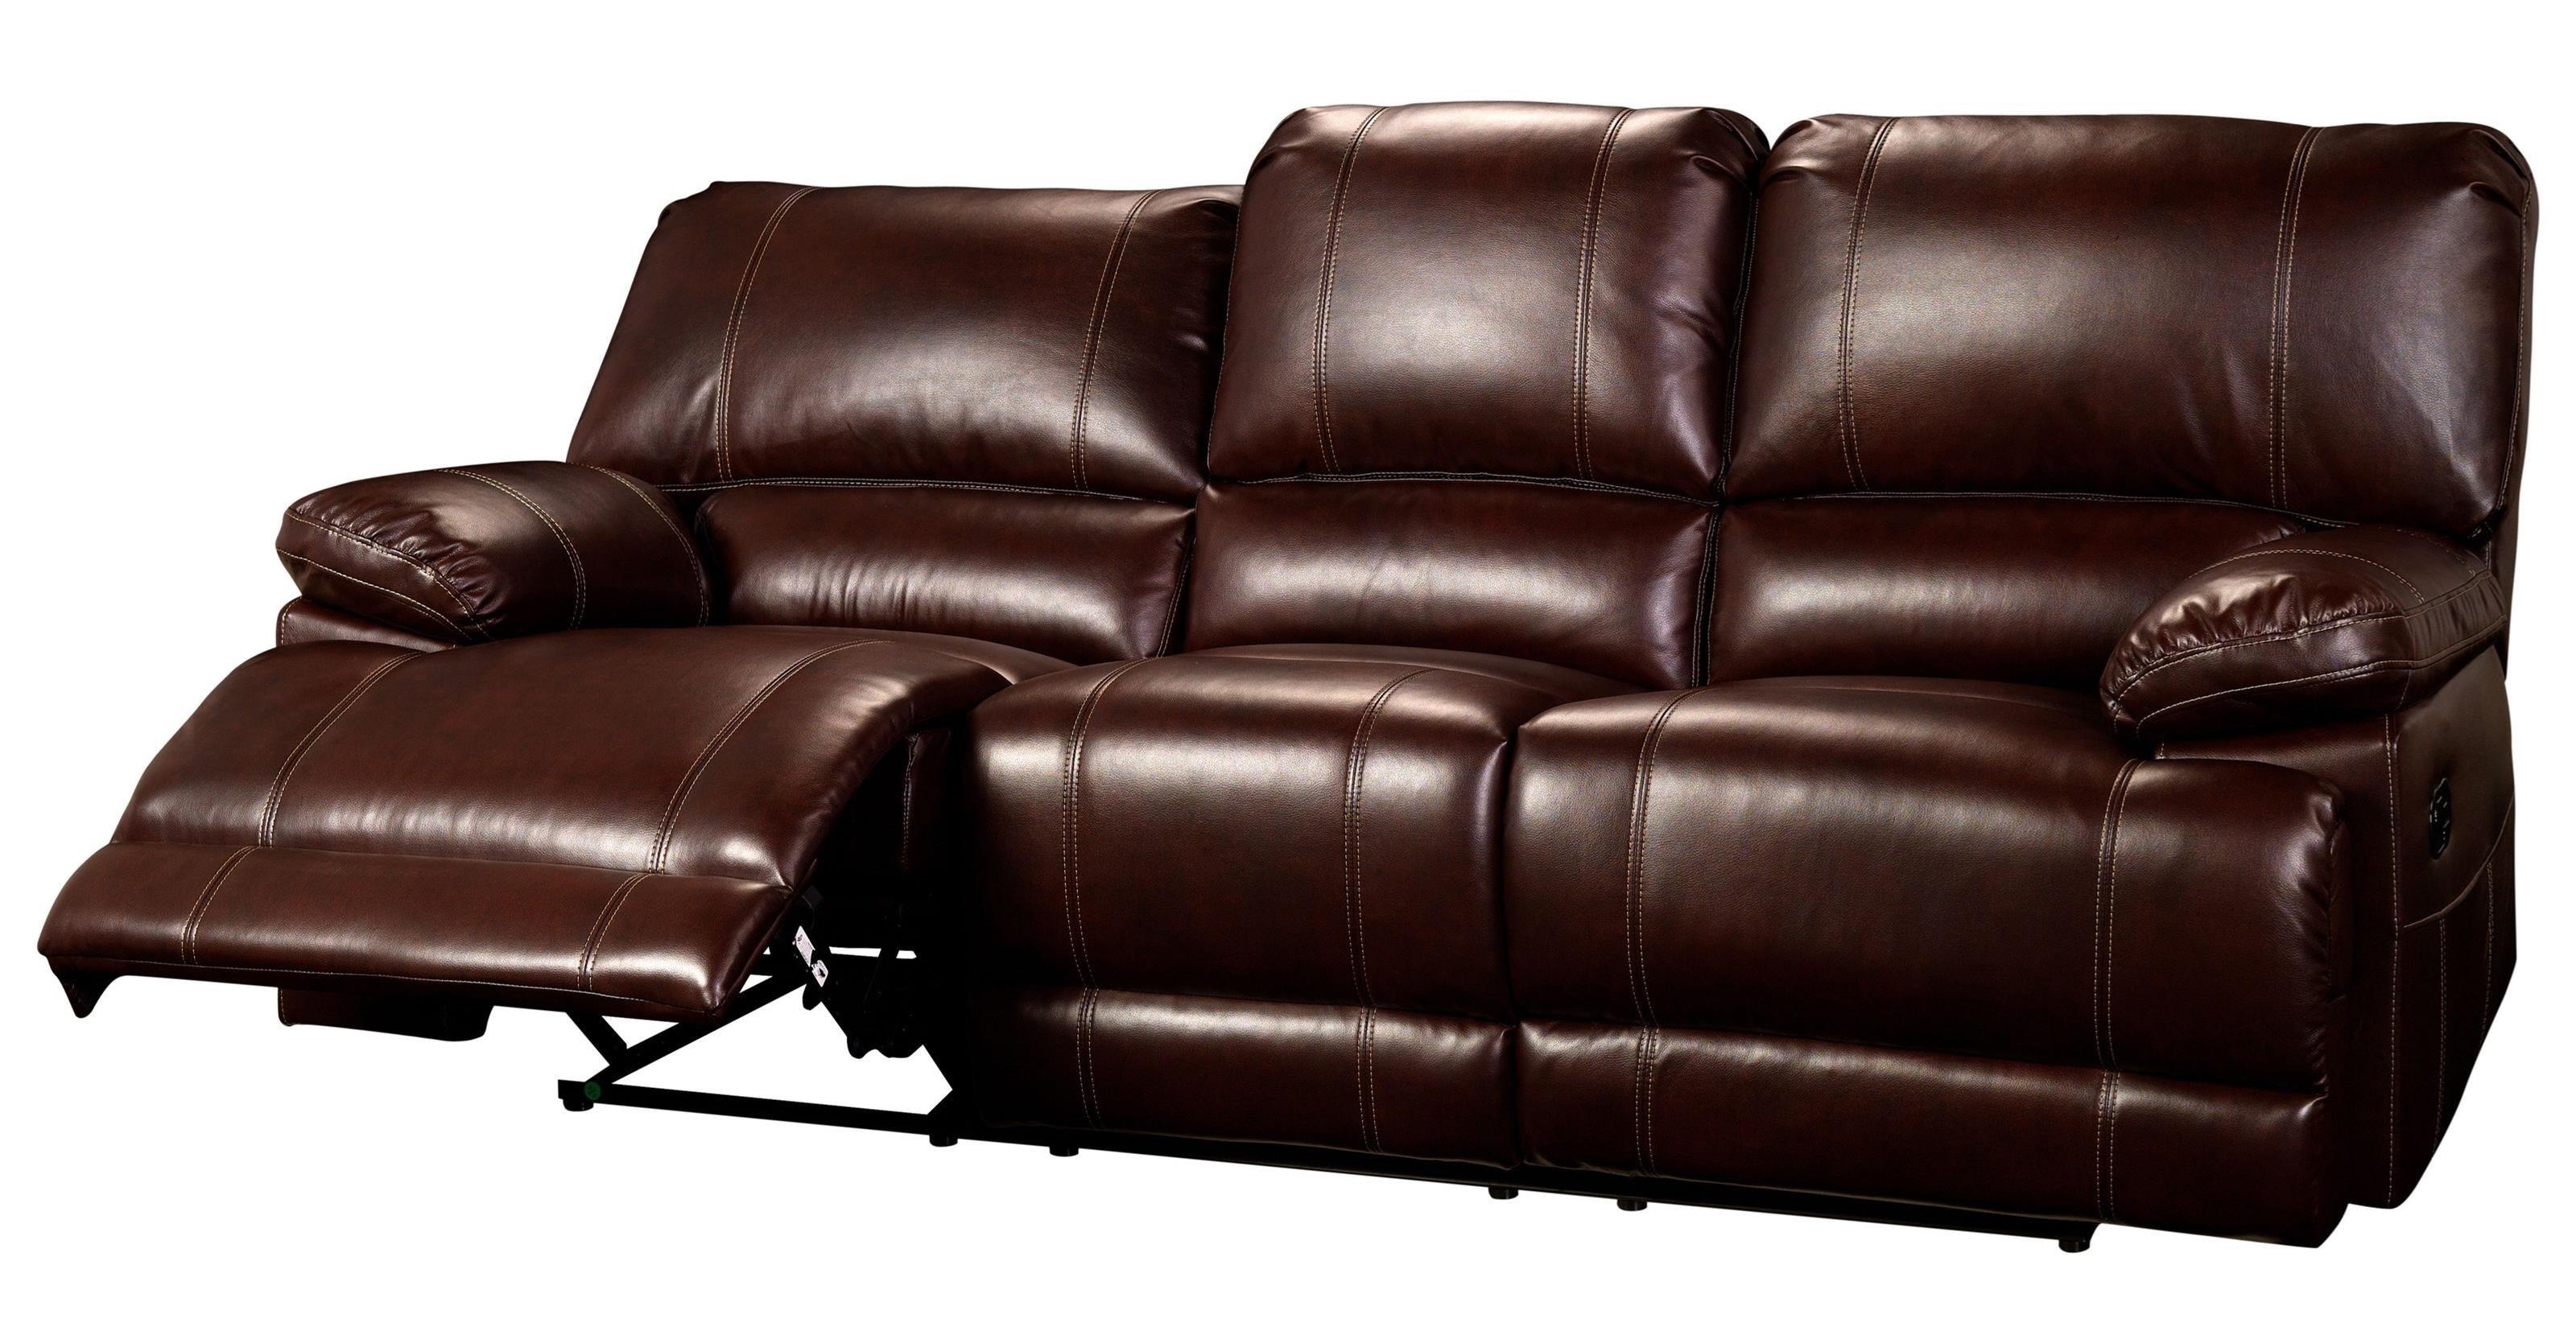 New Classic WyomingDual Recliner Sofa; New Classic WyomingDual Recliner Sofa  ...